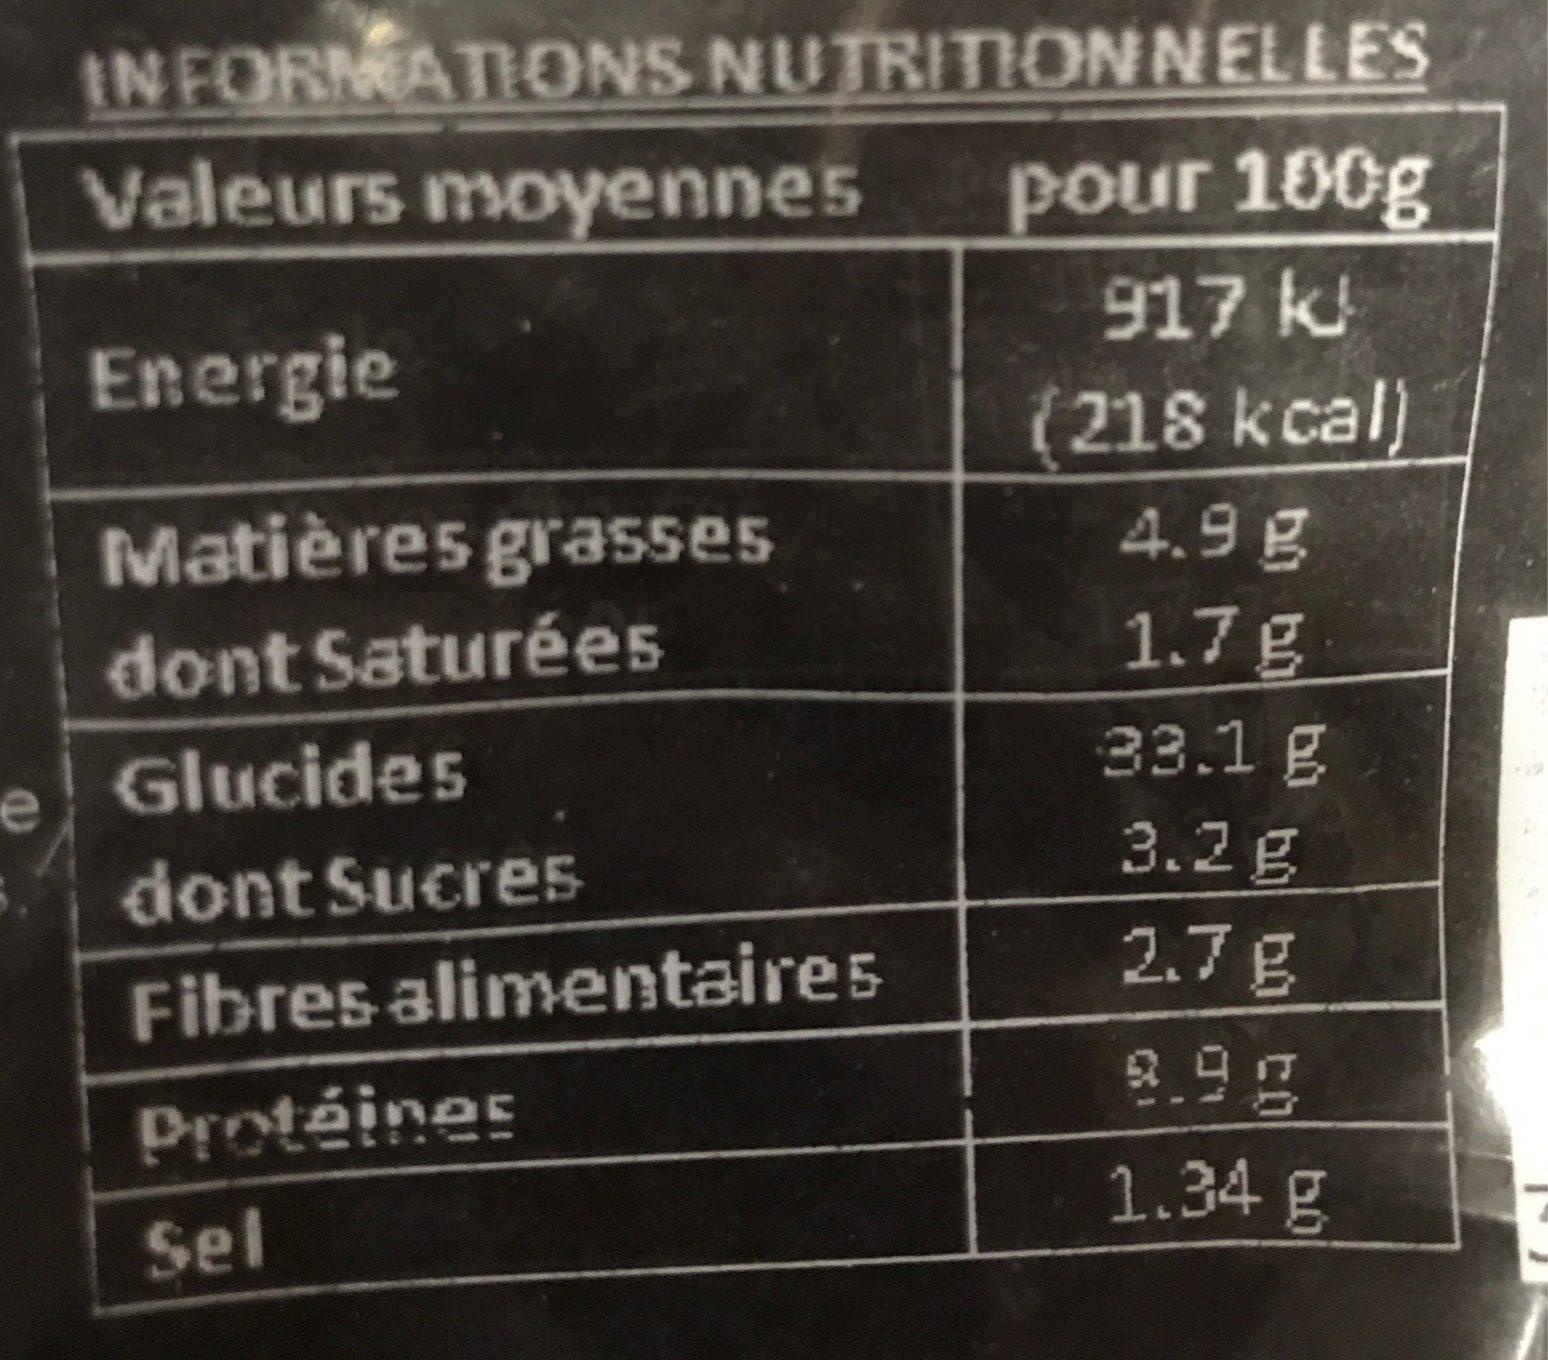 Piperade au chorizo - Nutrition facts